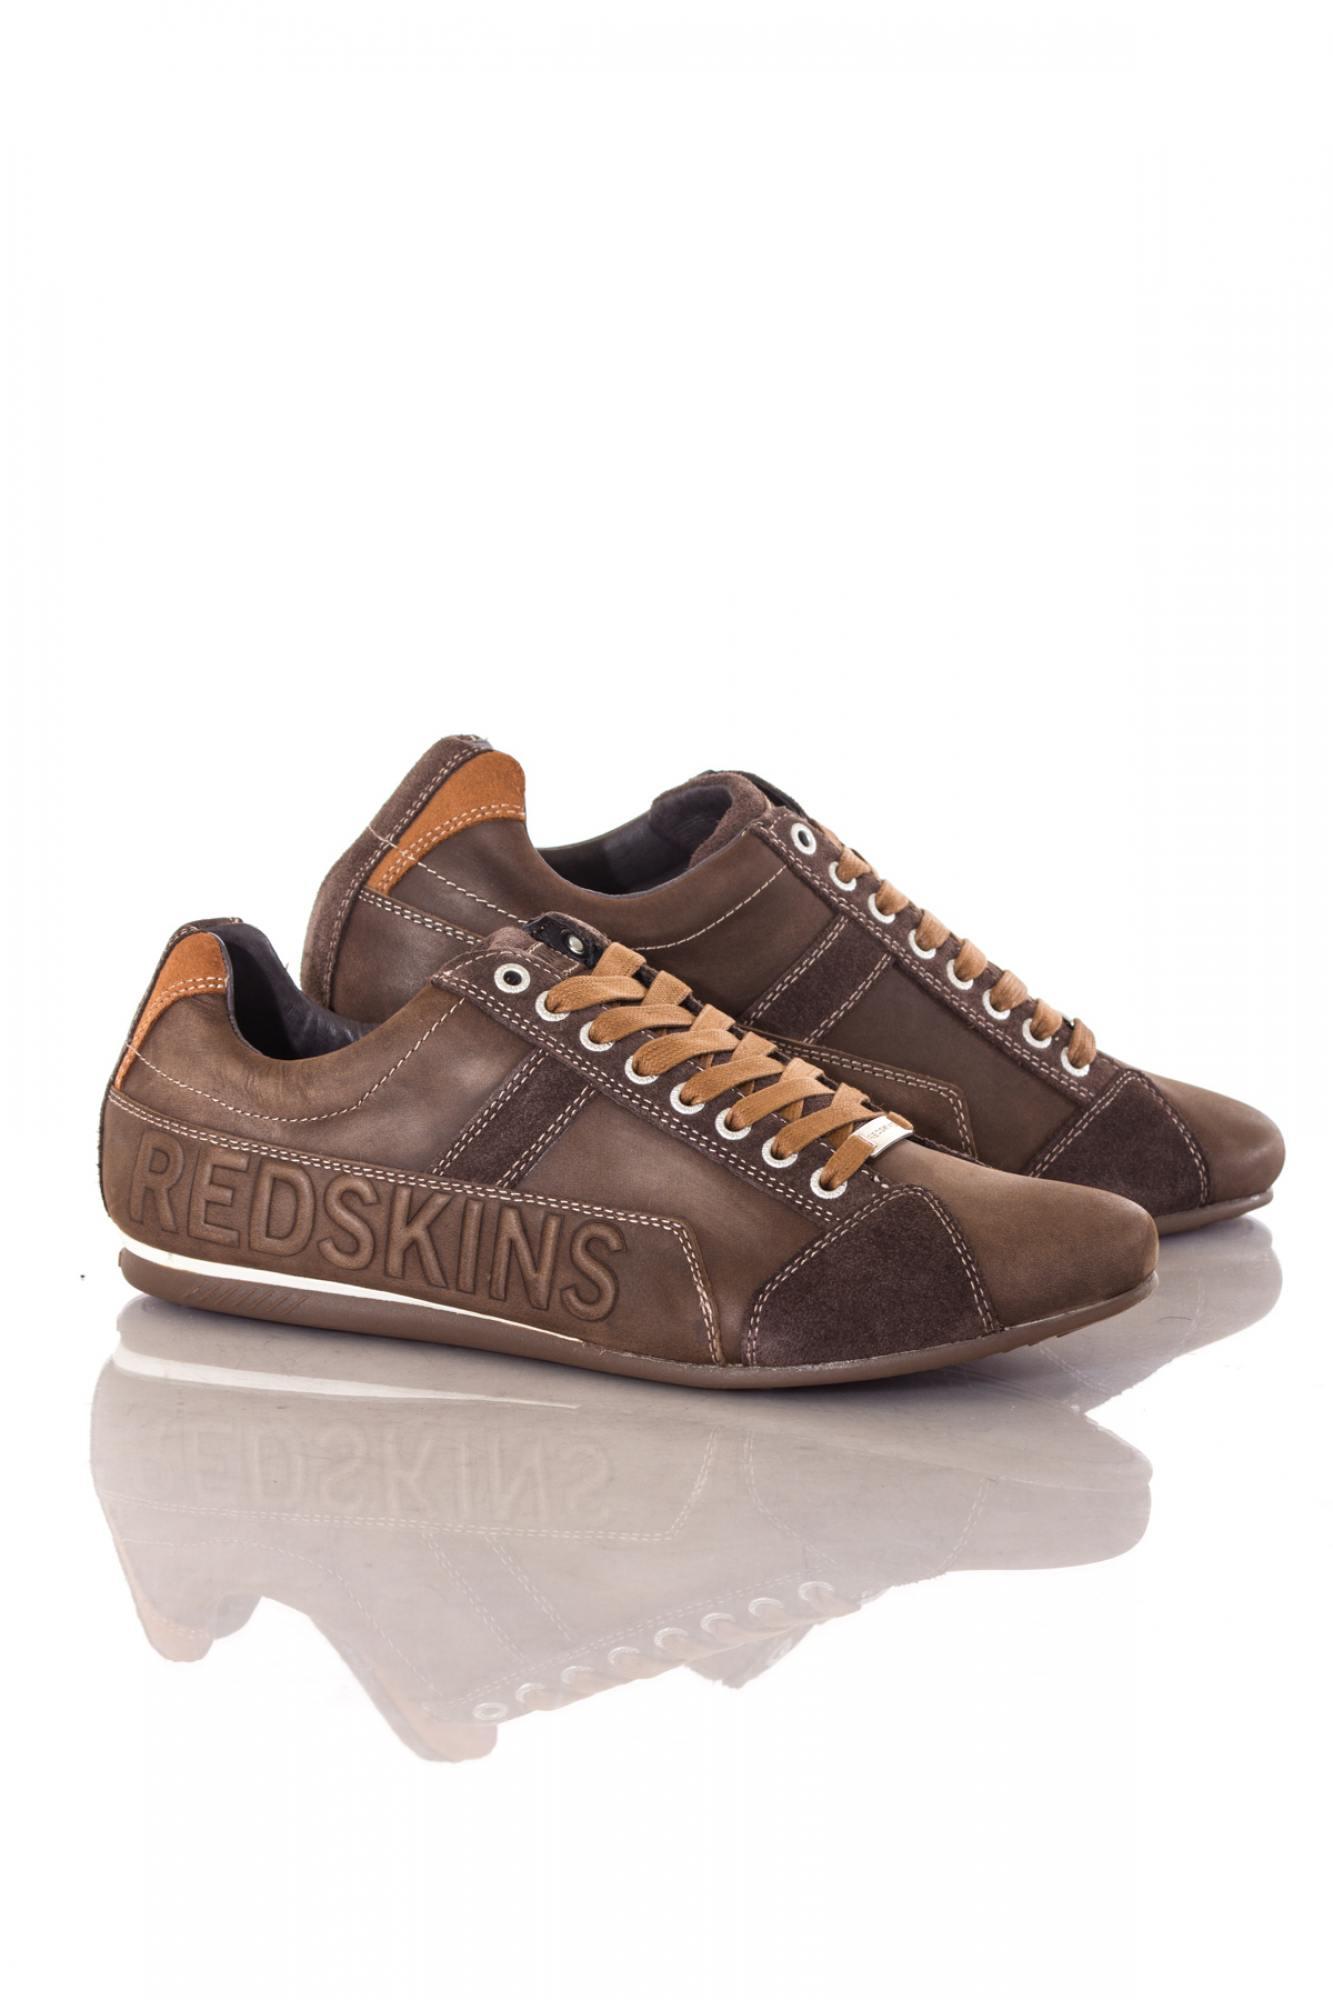 baskets en cuir homme chaussures redskins cuesto chocolat. Black Bedroom Furniture Sets. Home Design Ideas